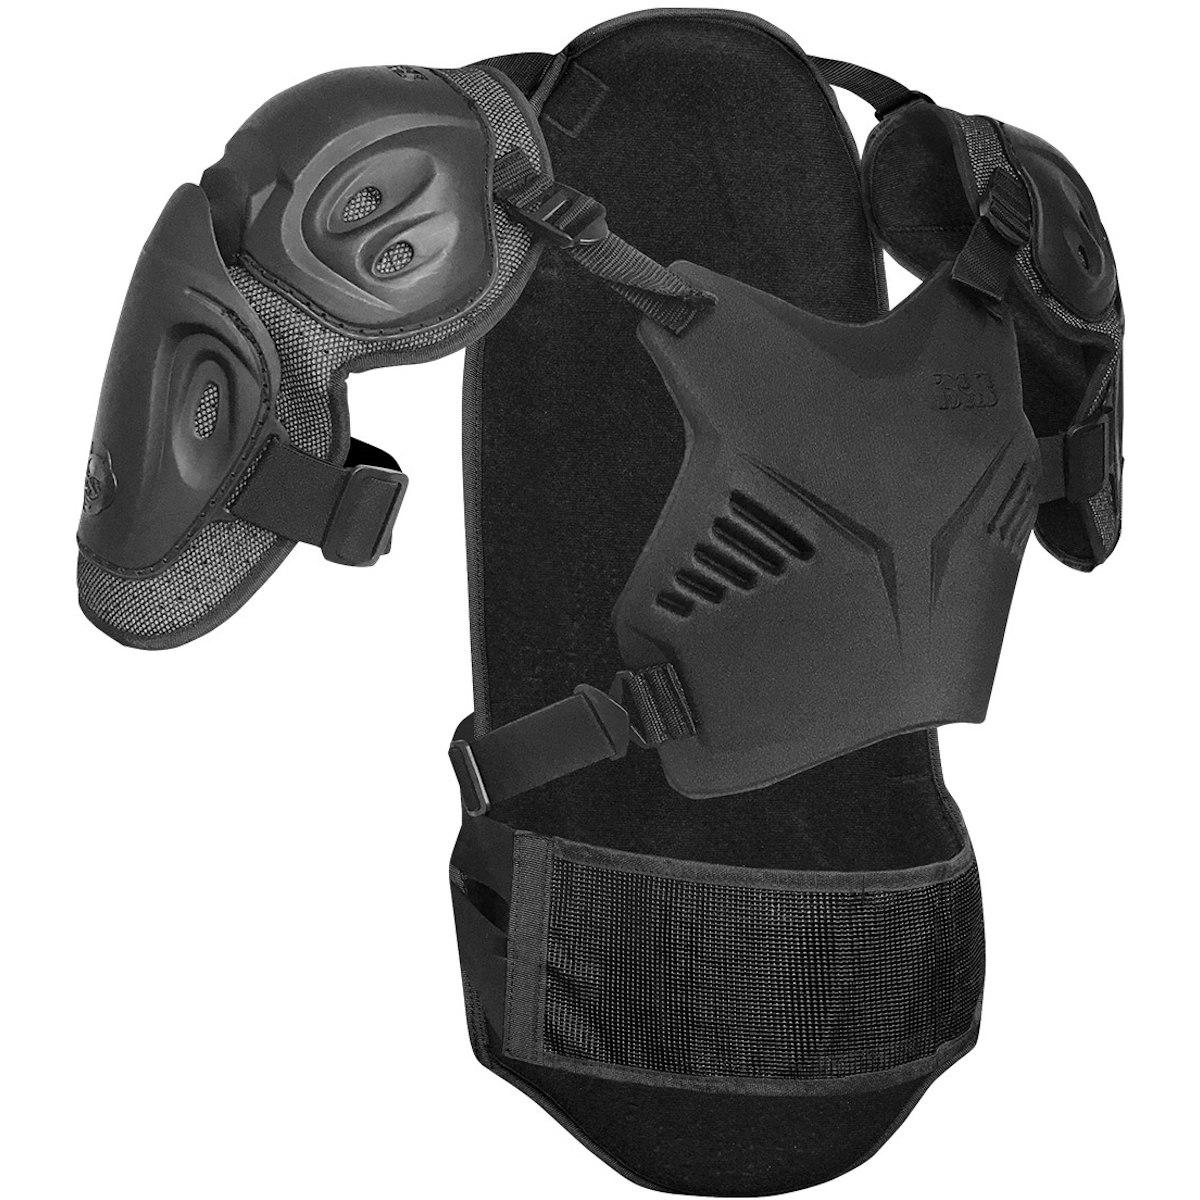 iXS Hammer Evo Protection Kinder-Protektorenjacke - black